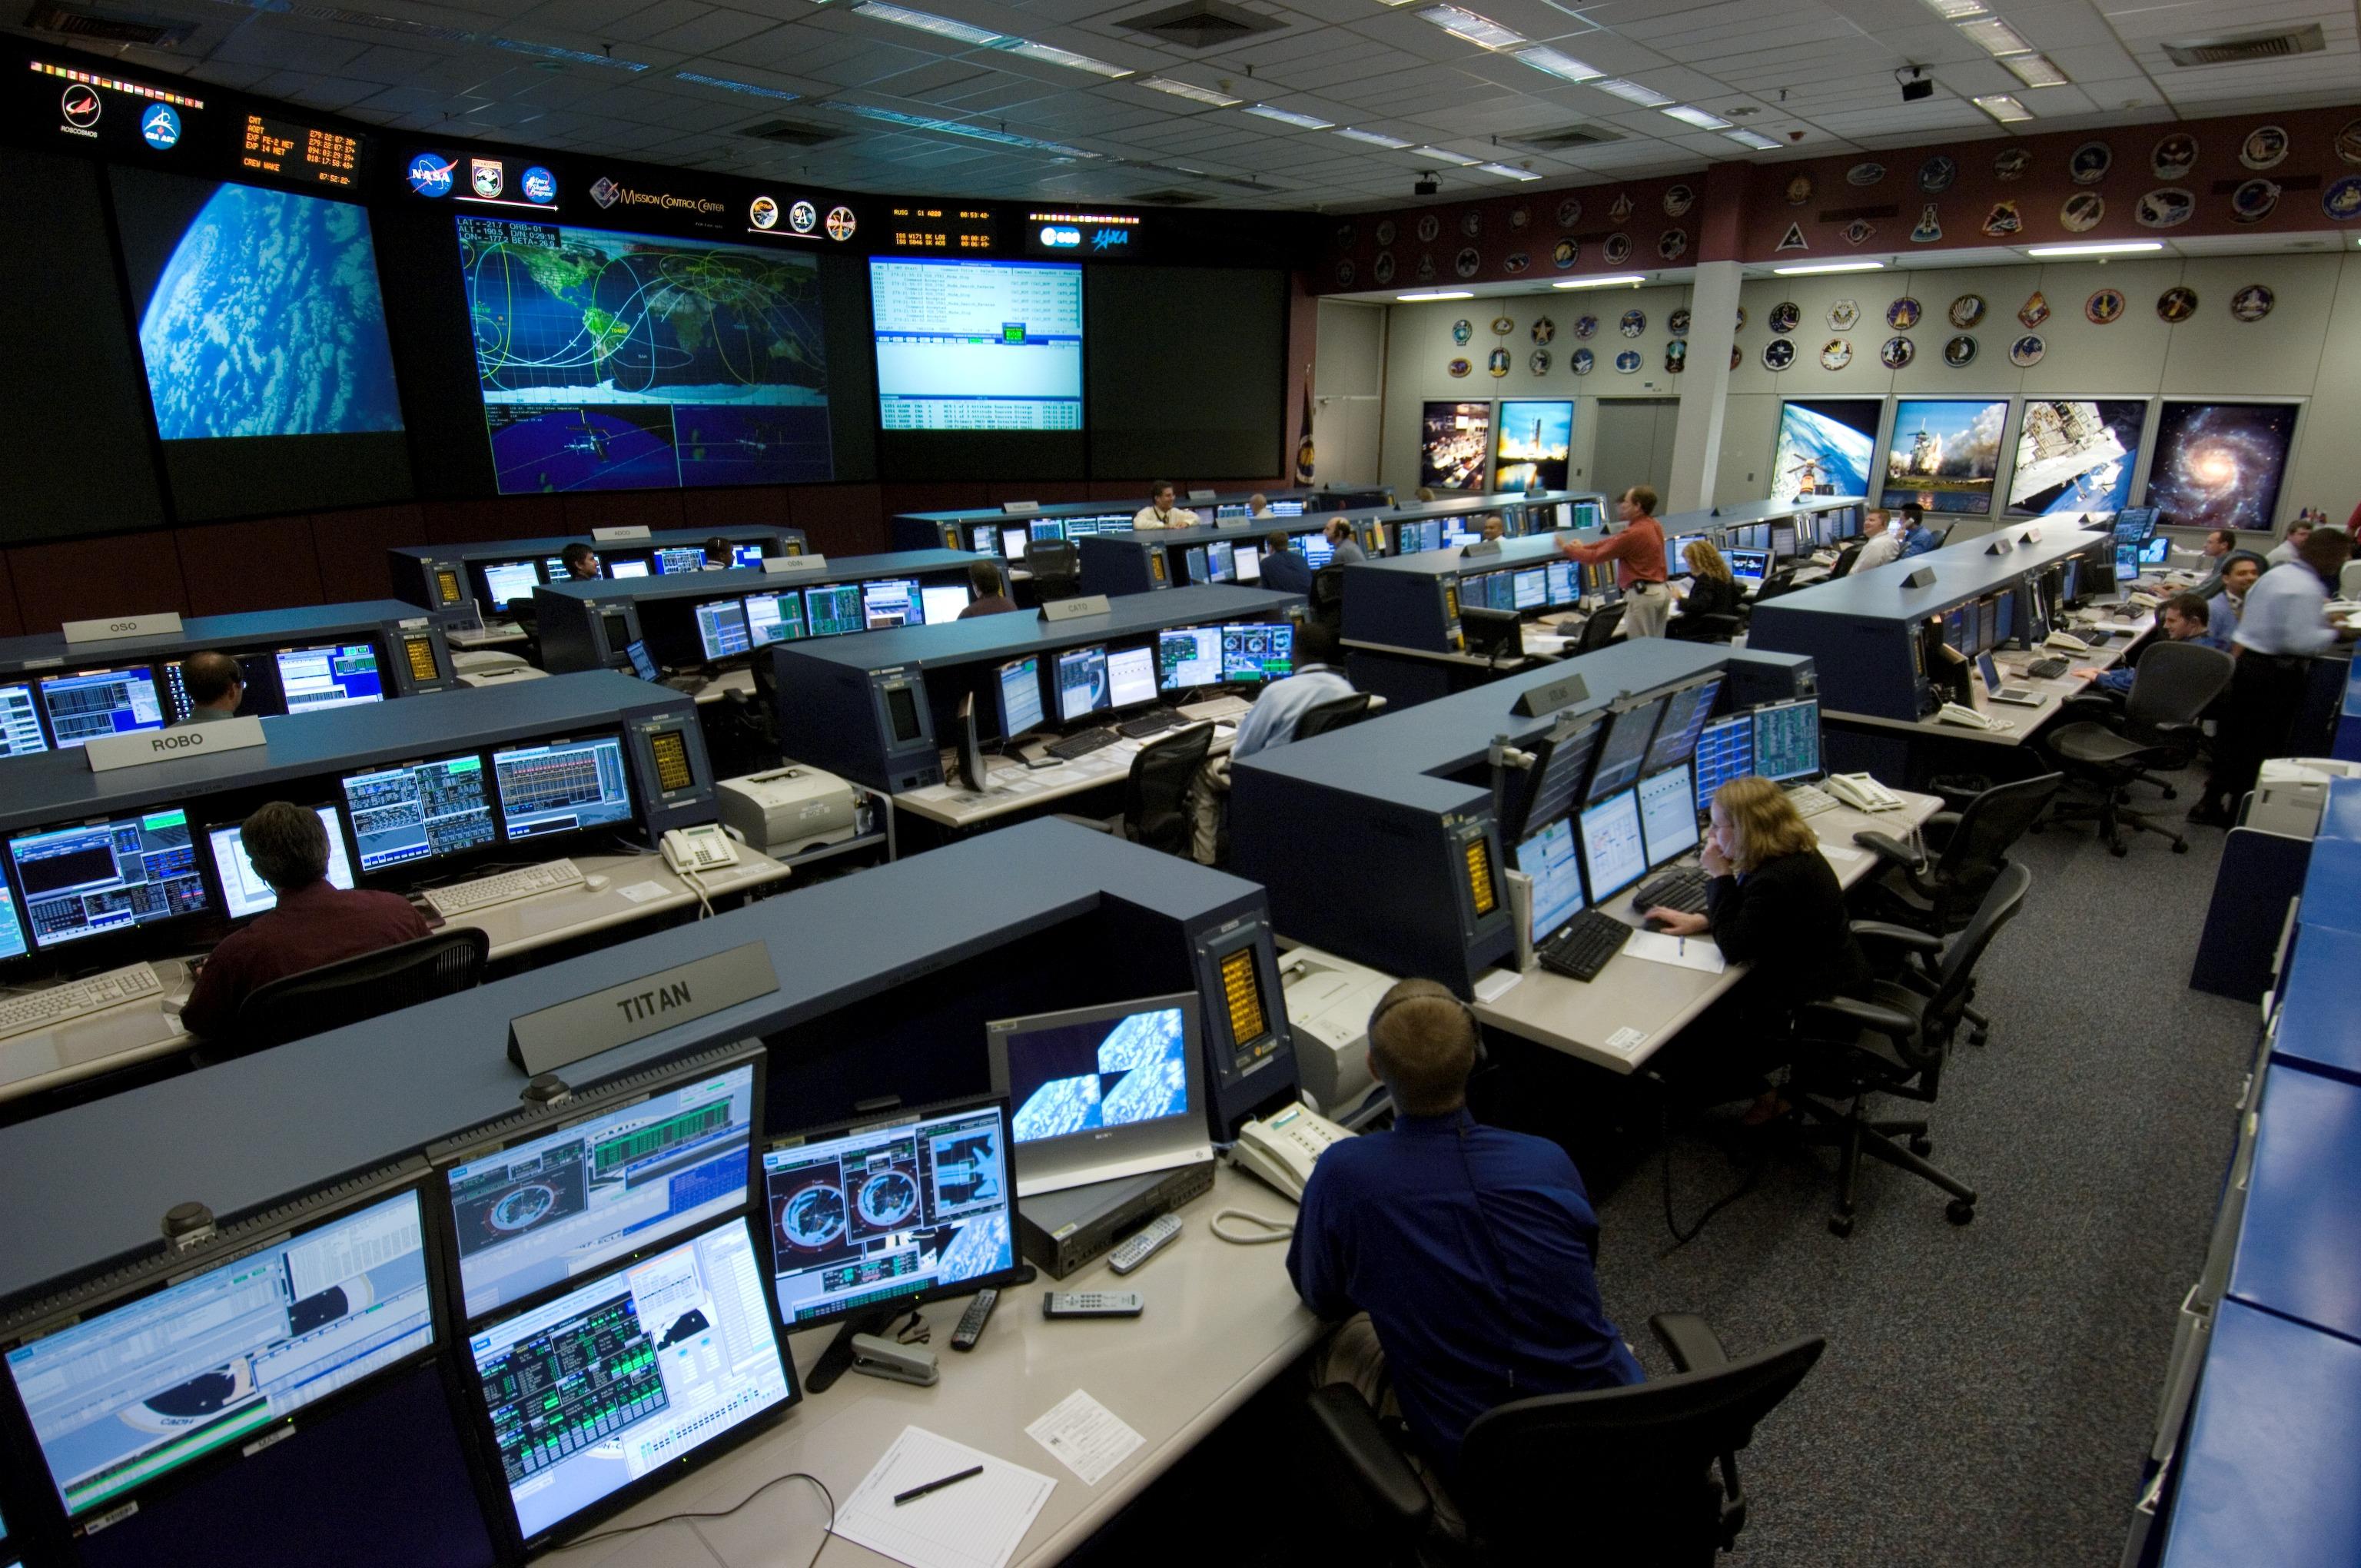 NASA - New Station Flight Control Room